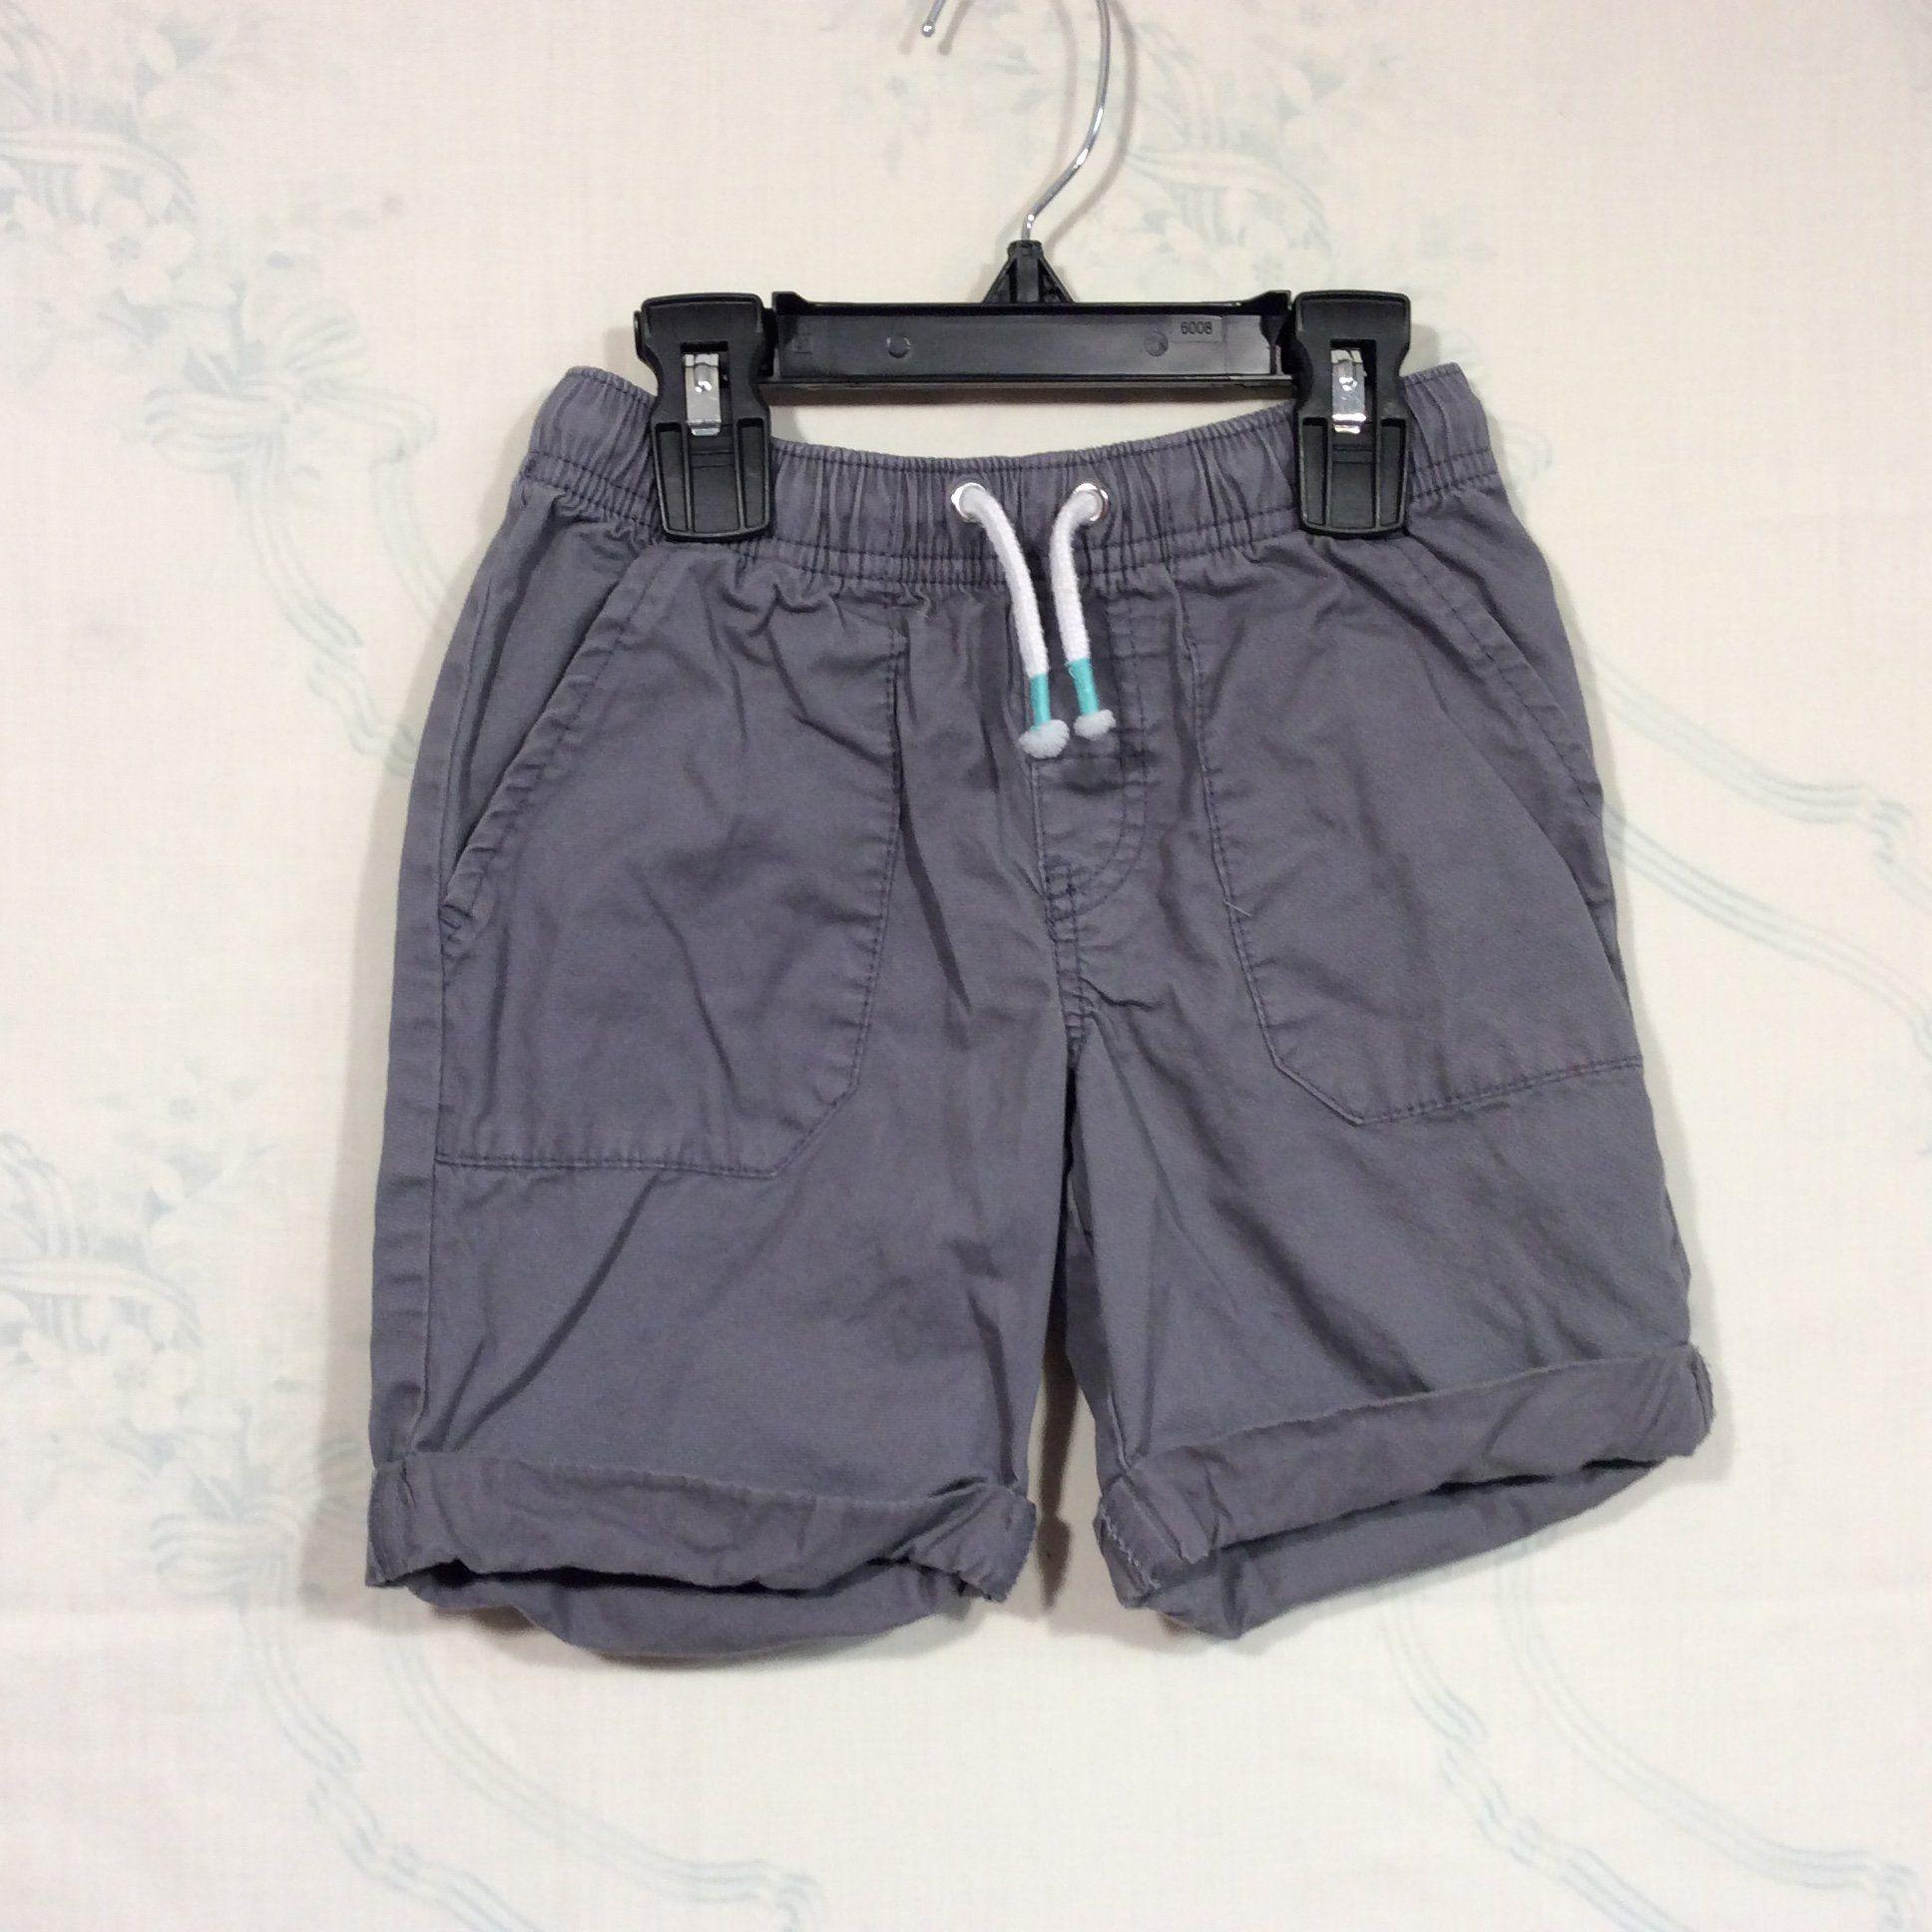 Cat u jack gray elastic waist shorts t products